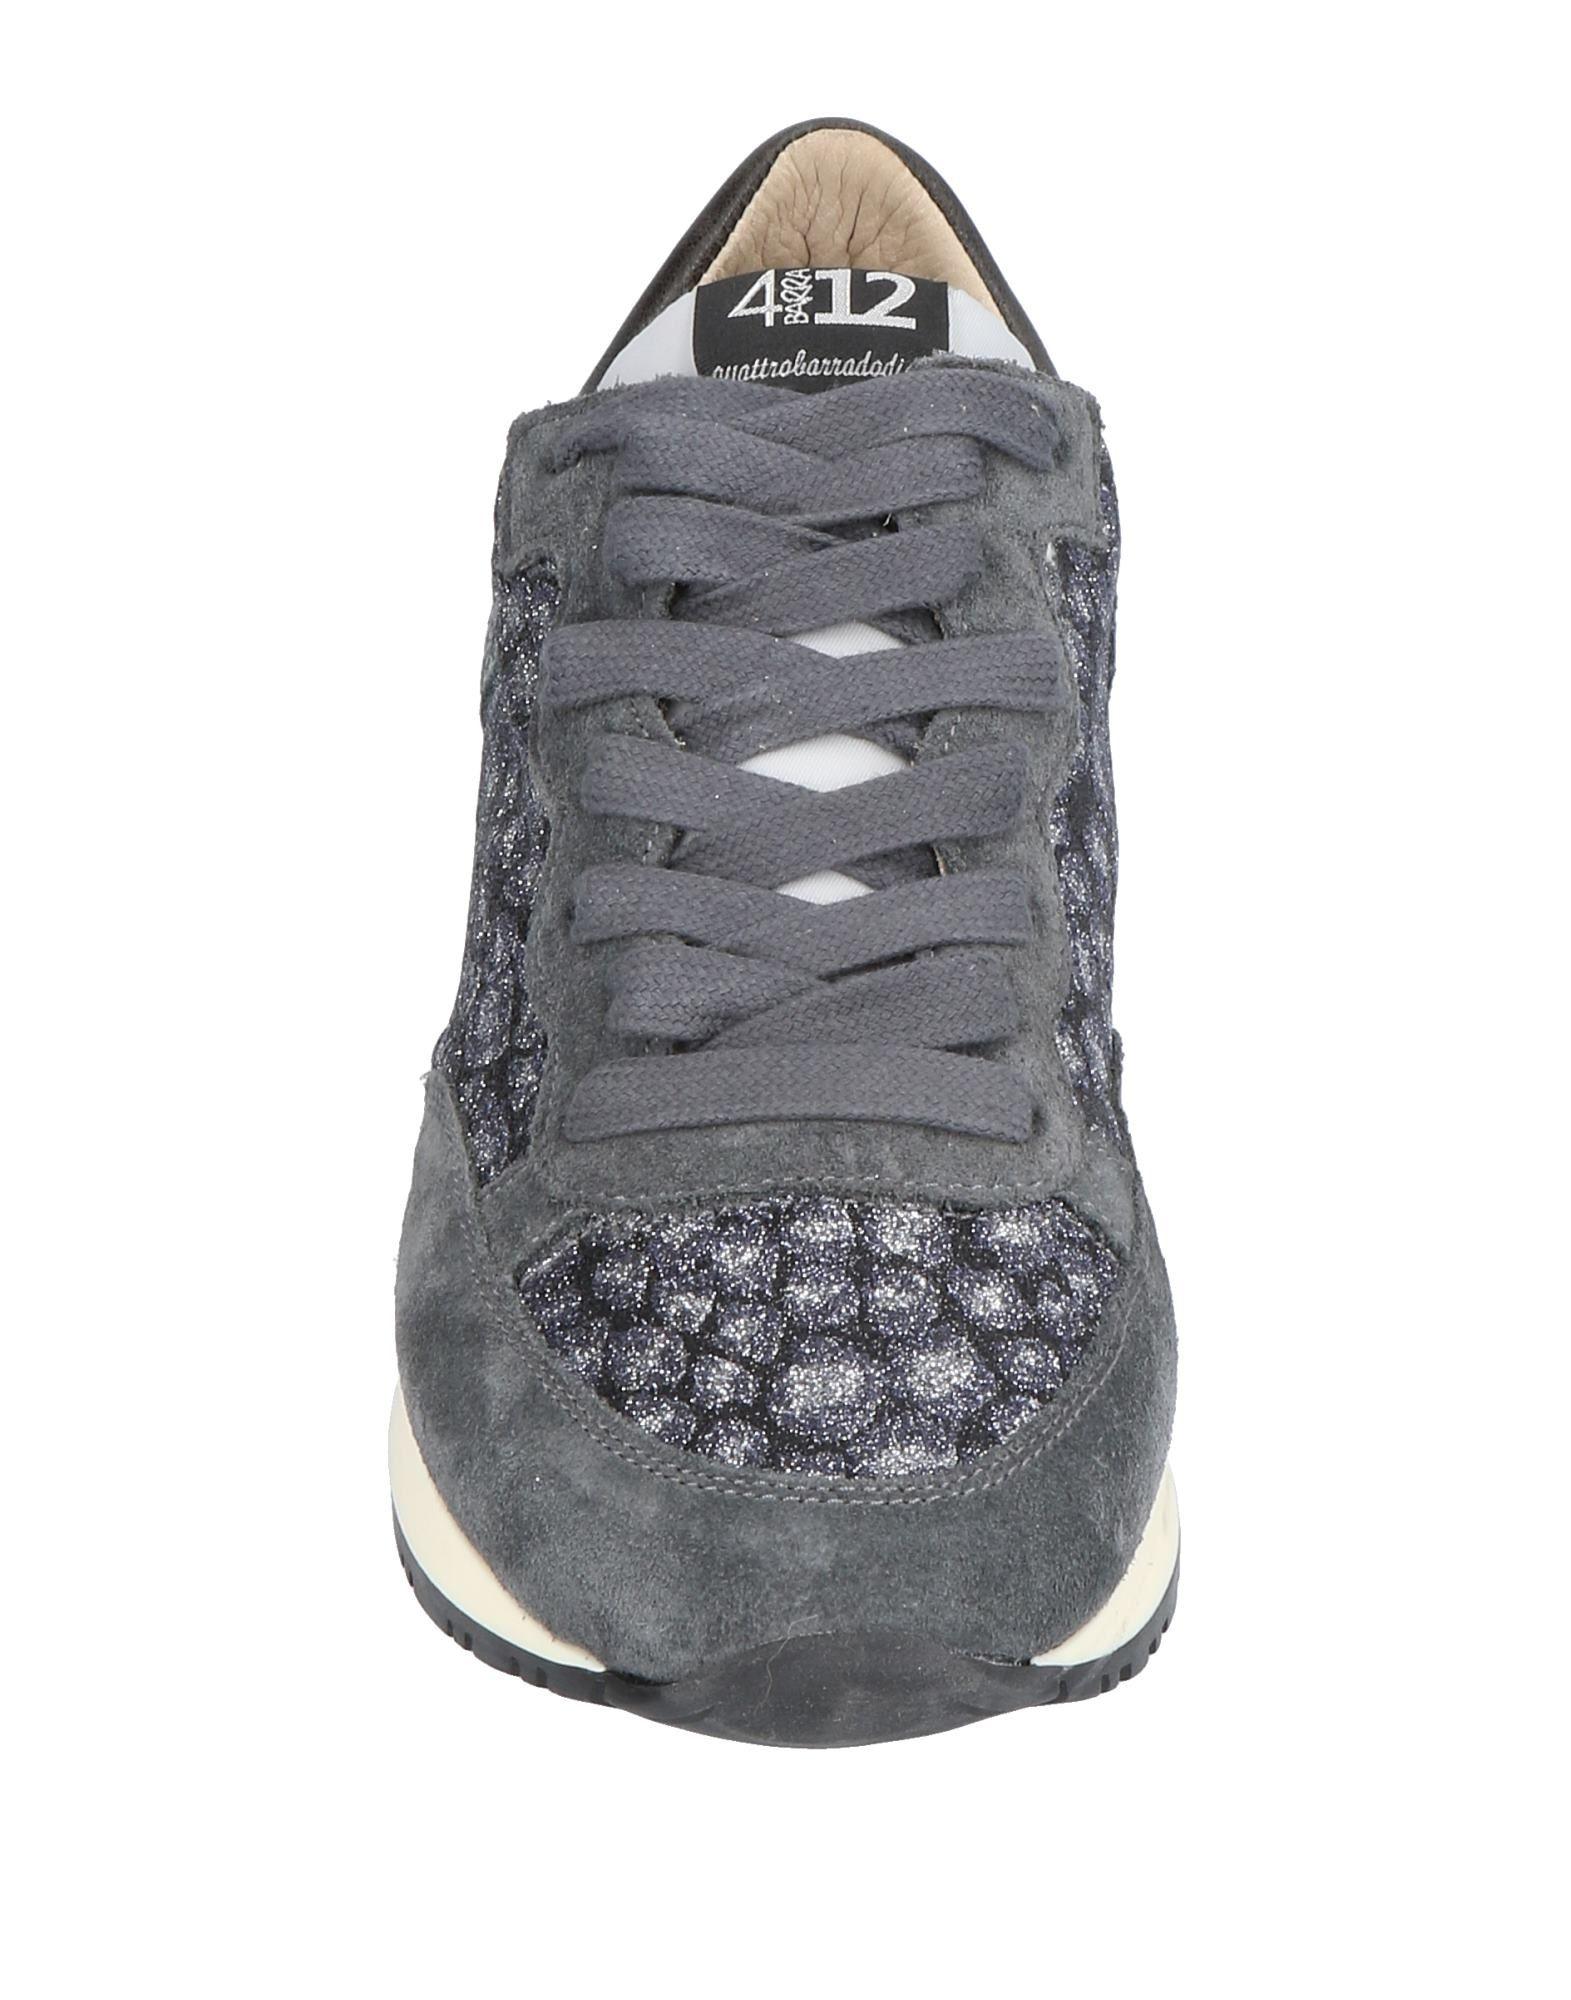 Quattrobarradodici Sneakers Damen beliebte  11433782RV Gute Qualität beliebte Damen Schuhe d14901